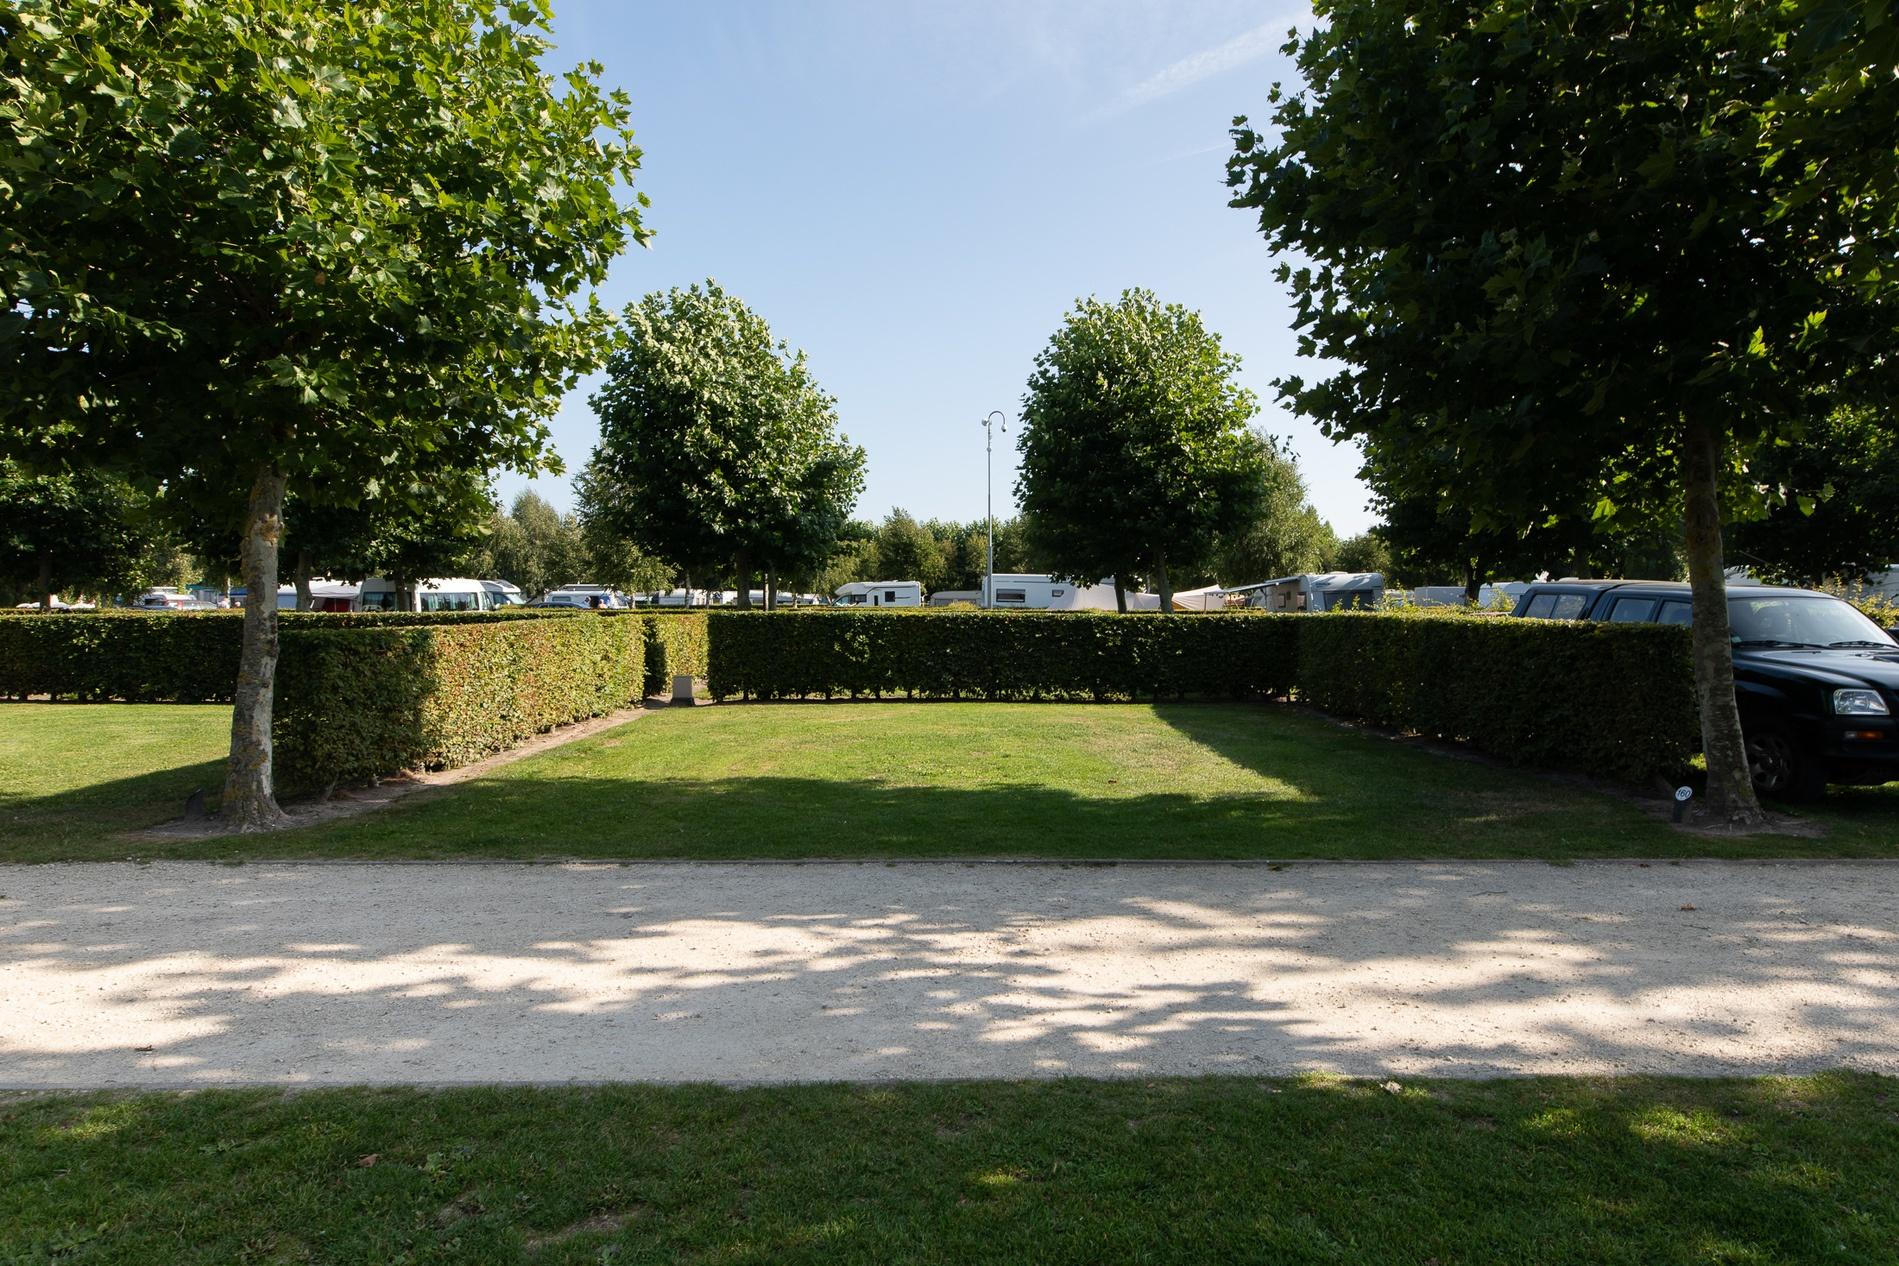 Belgie-Jabbeke-Camping%20Klein%20Strand-ExtraLarge Campings België